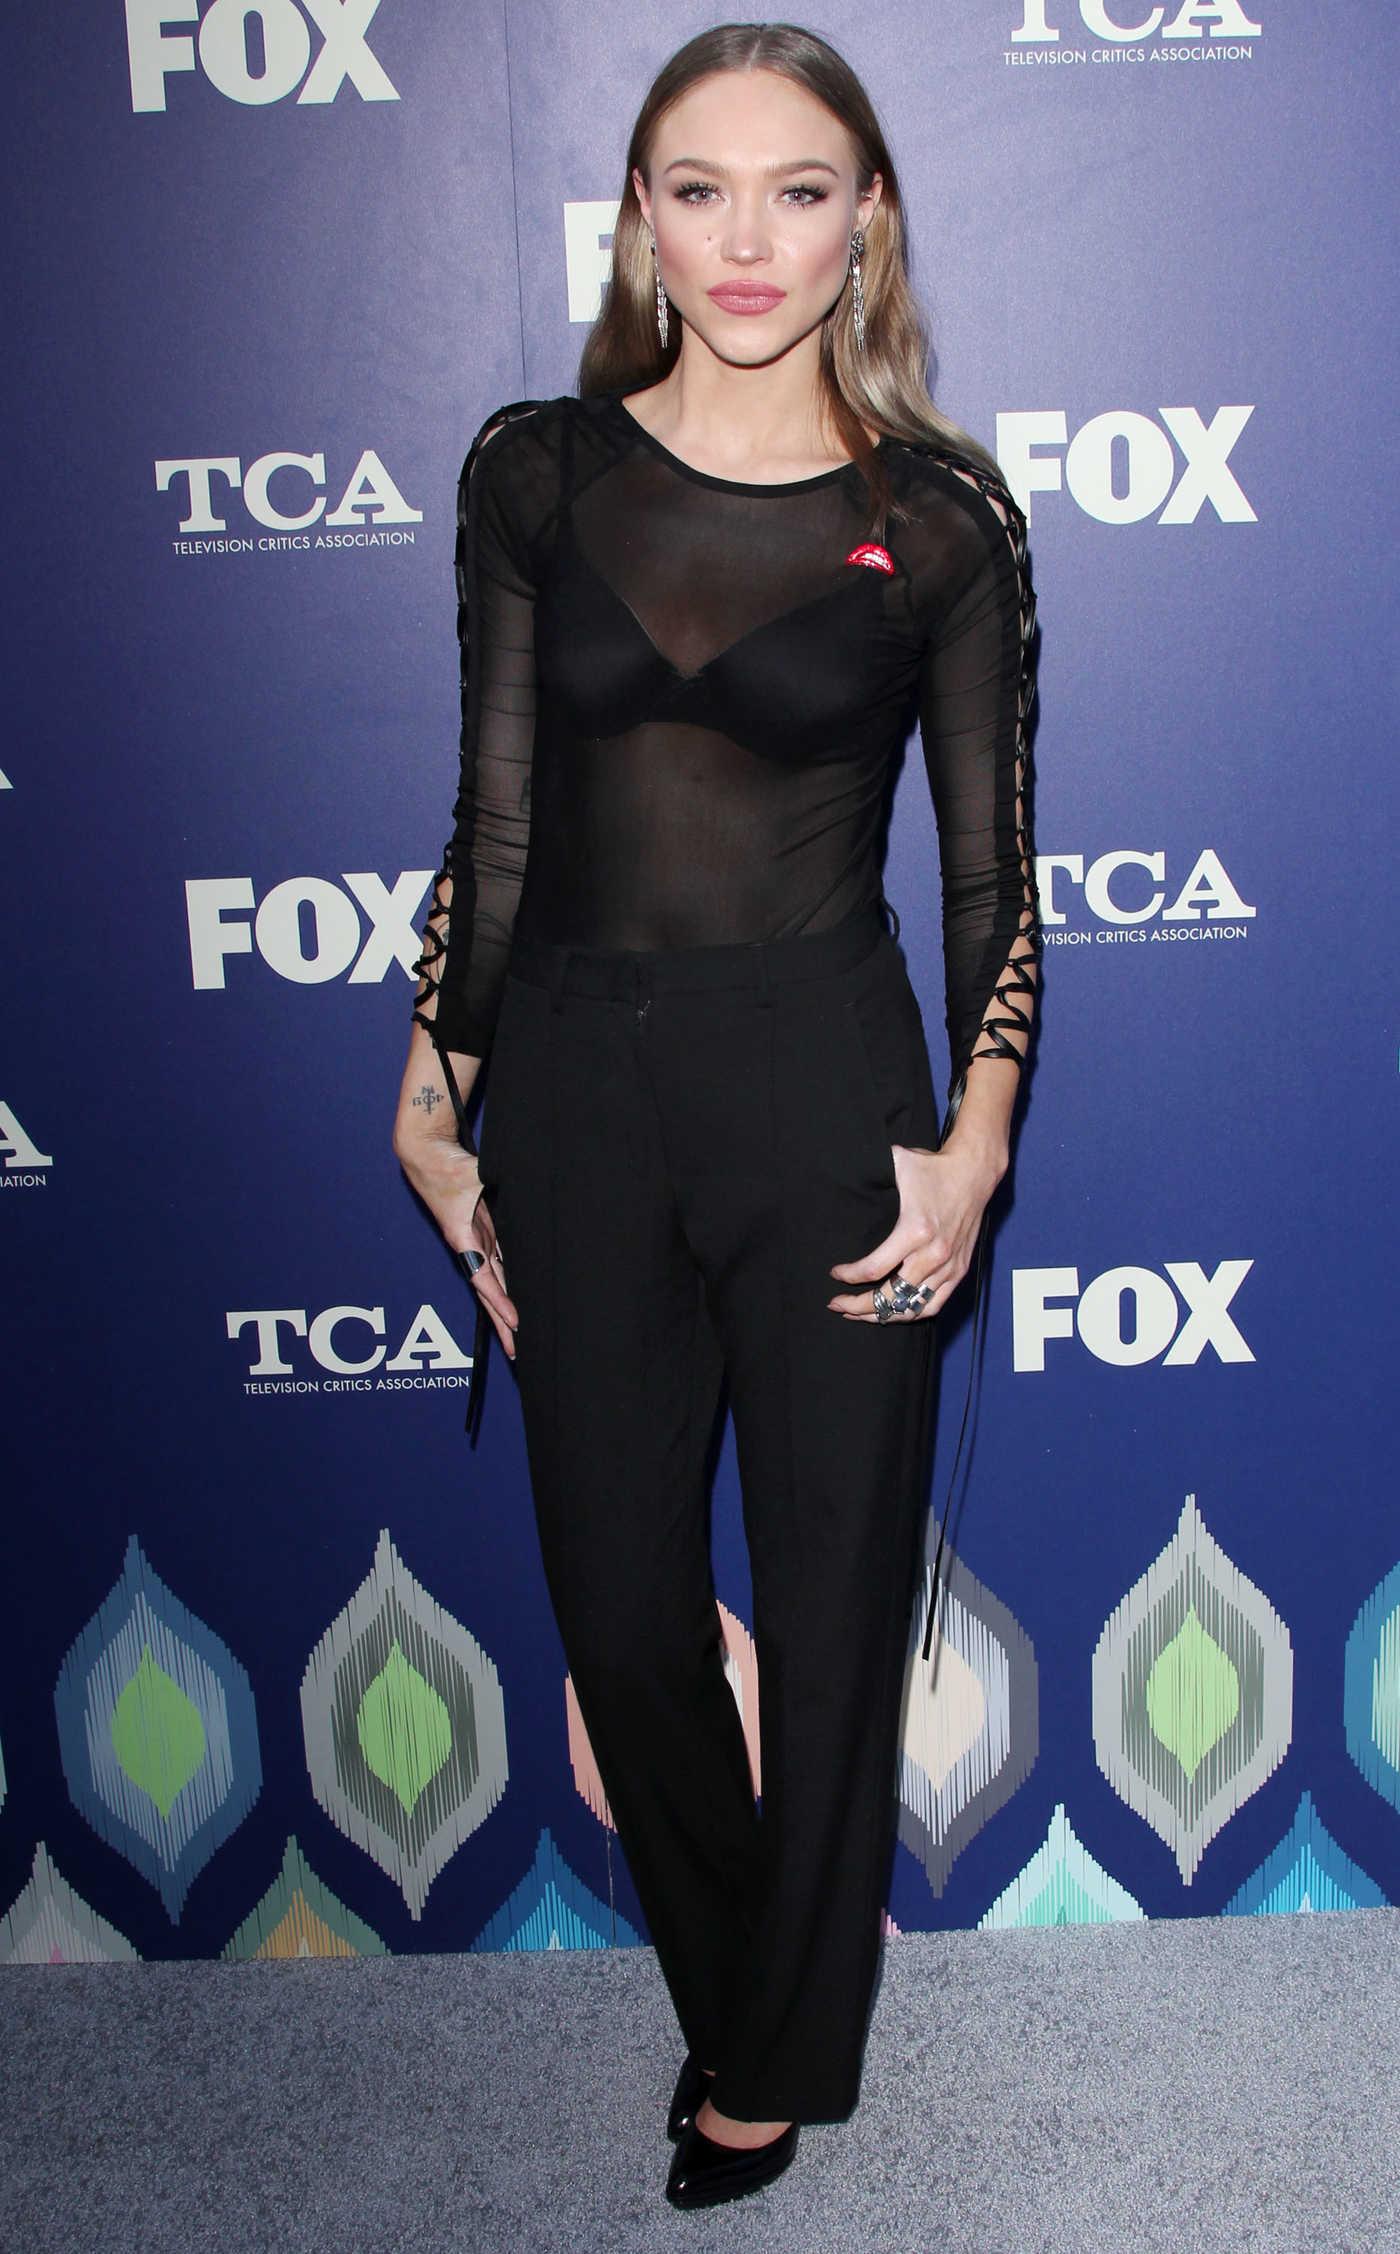 Kelly Van Der Burg at 2016 FOX Summer TCA Press Tour Party in Los Angeles 08/08/2016-2